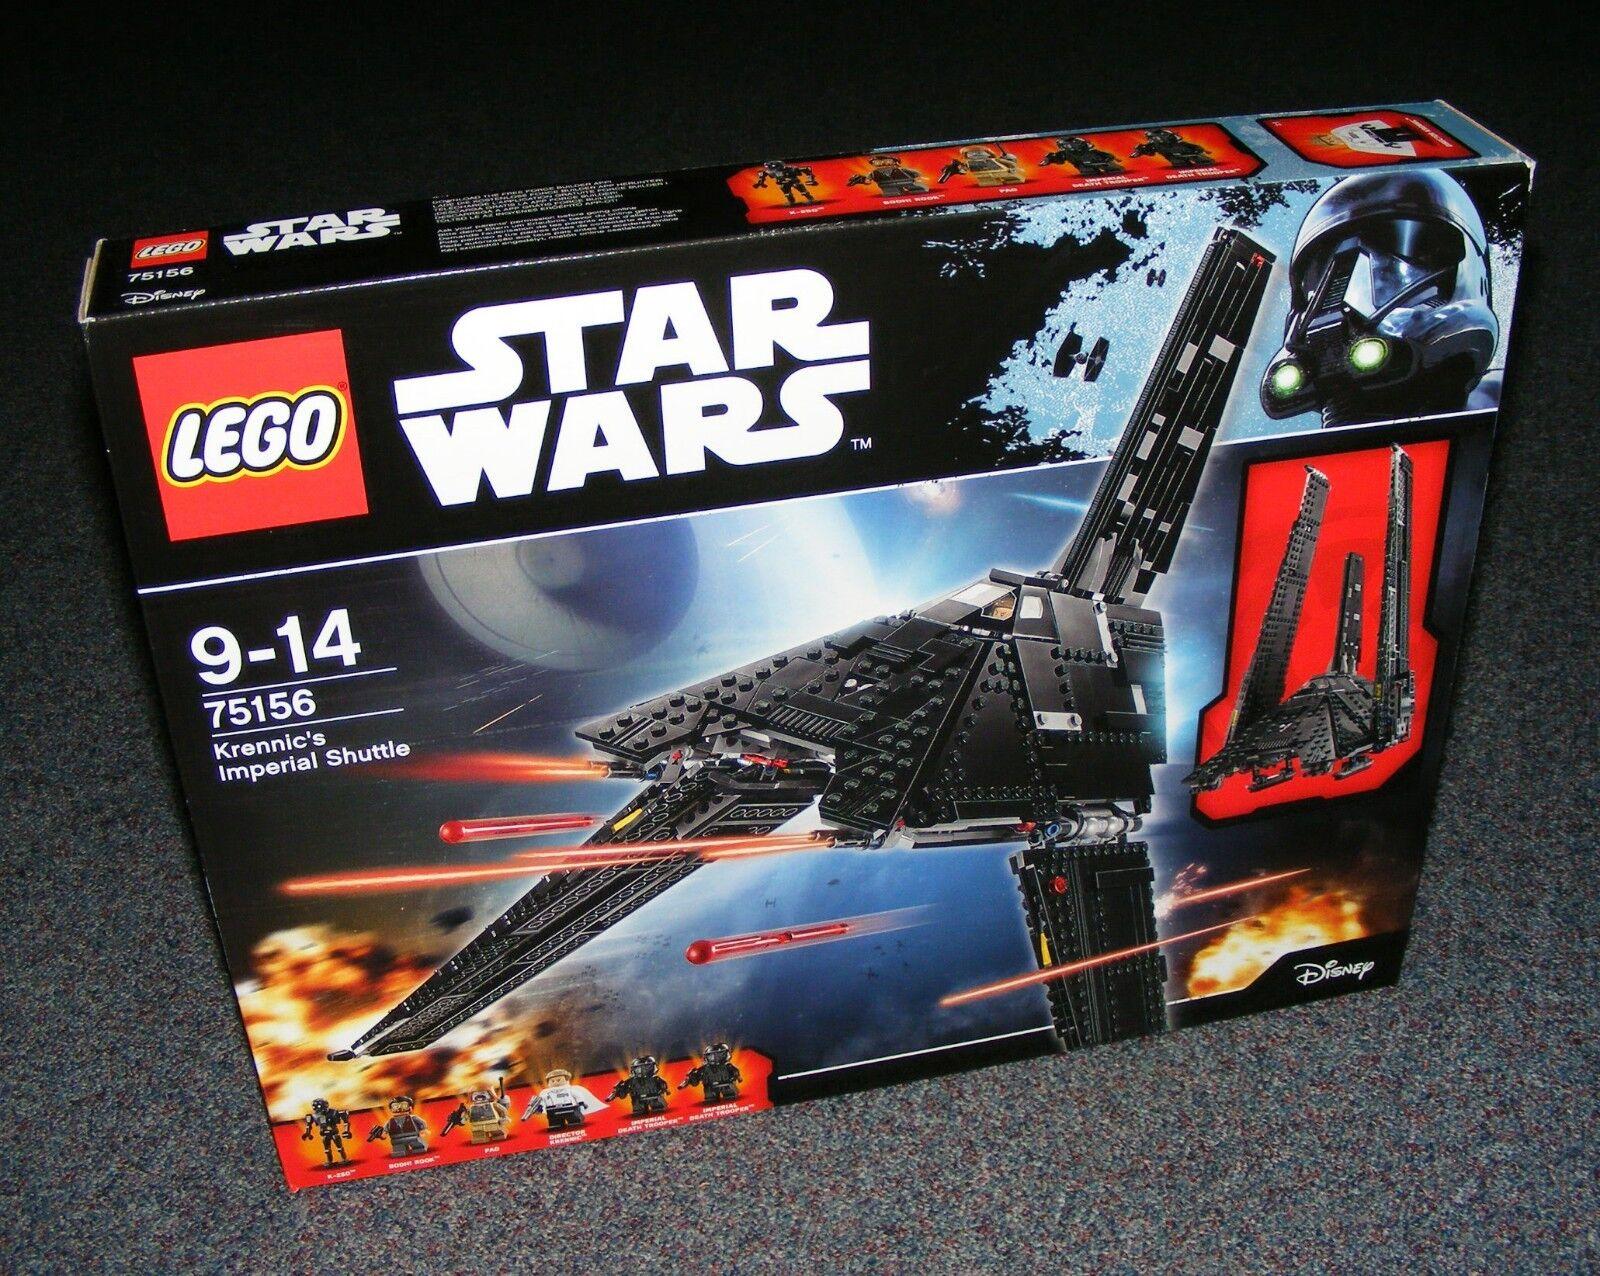 STAR WARS LEGO 75156 KRENNIC'S IMPERIAL SHUTTLE BRAND NEW SEALED BNIB